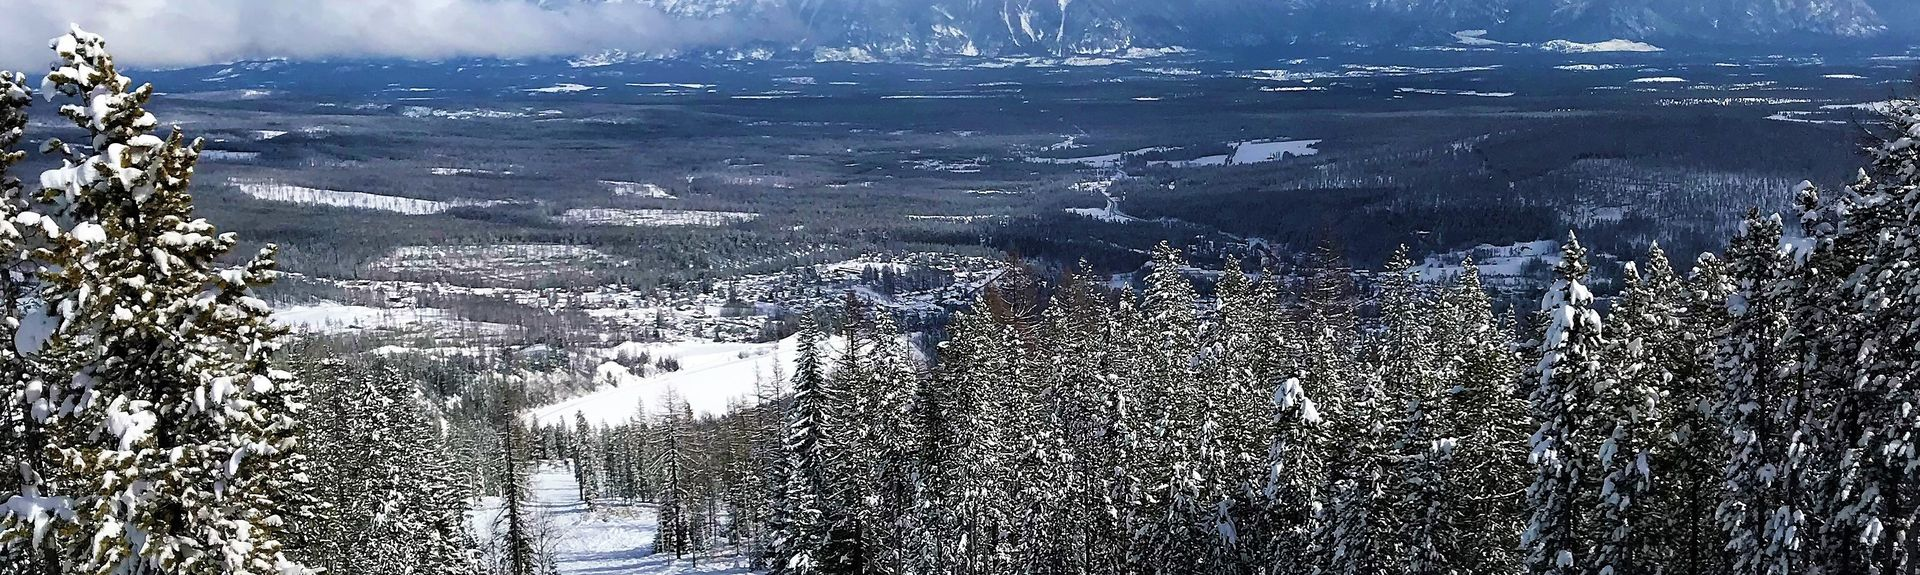 Trickle Creek (Kimberley, Britisk Columbia, Canada)